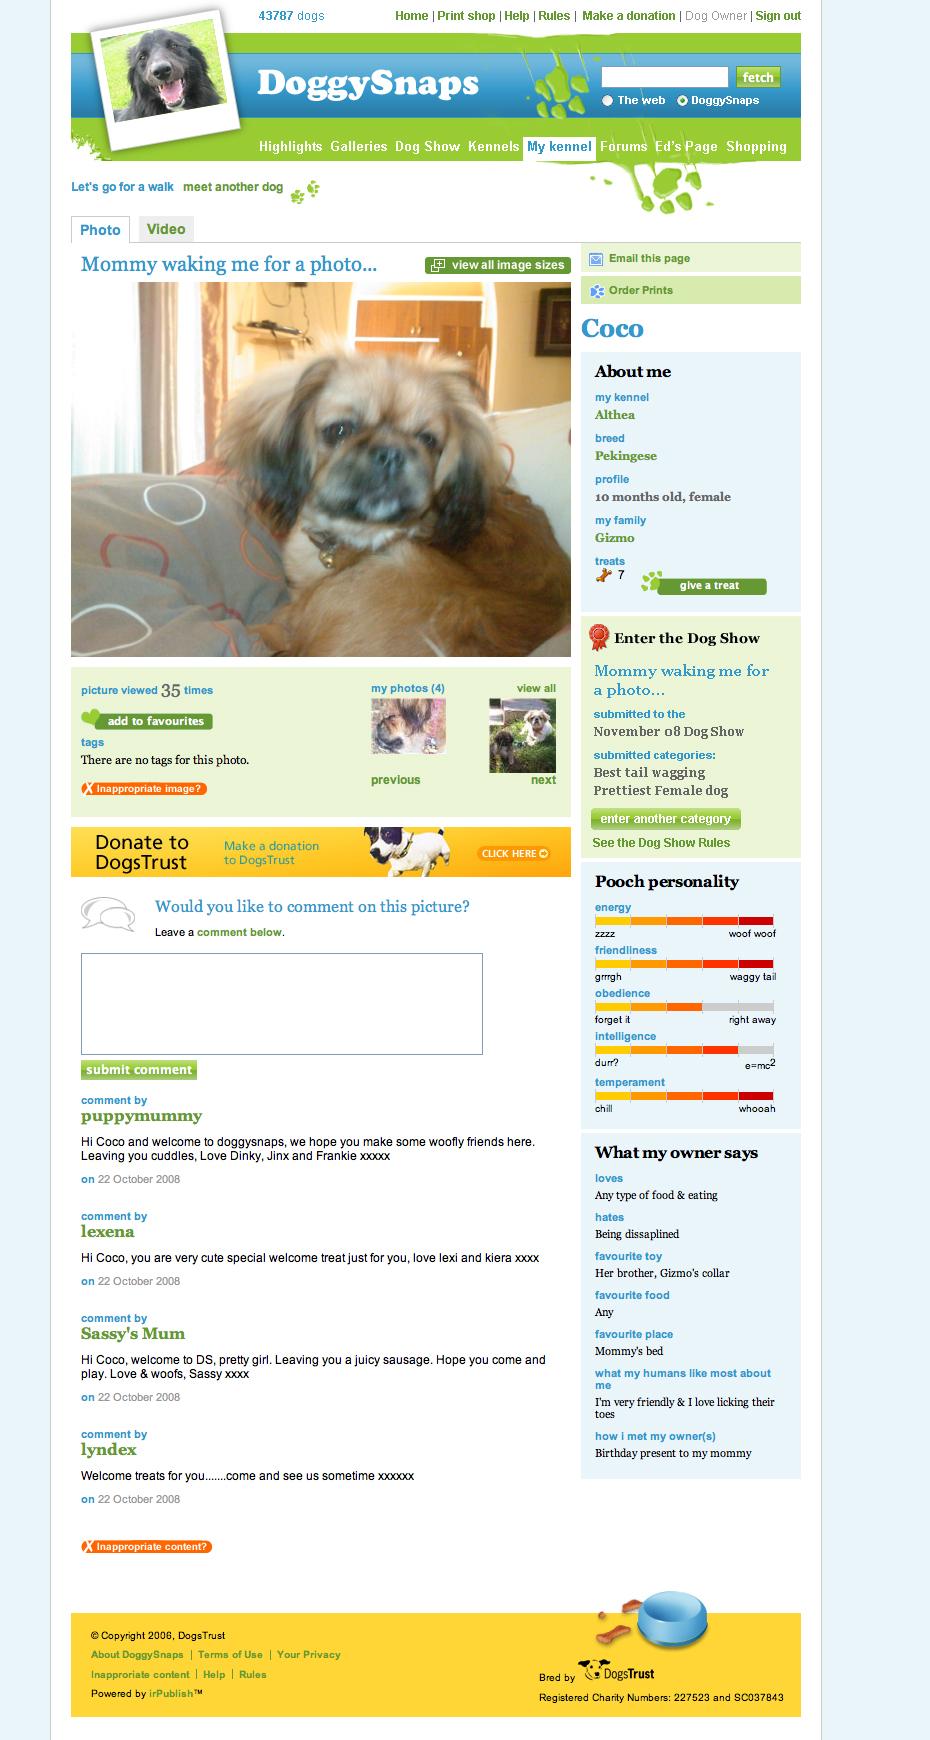 DoggySnaps - Dod page